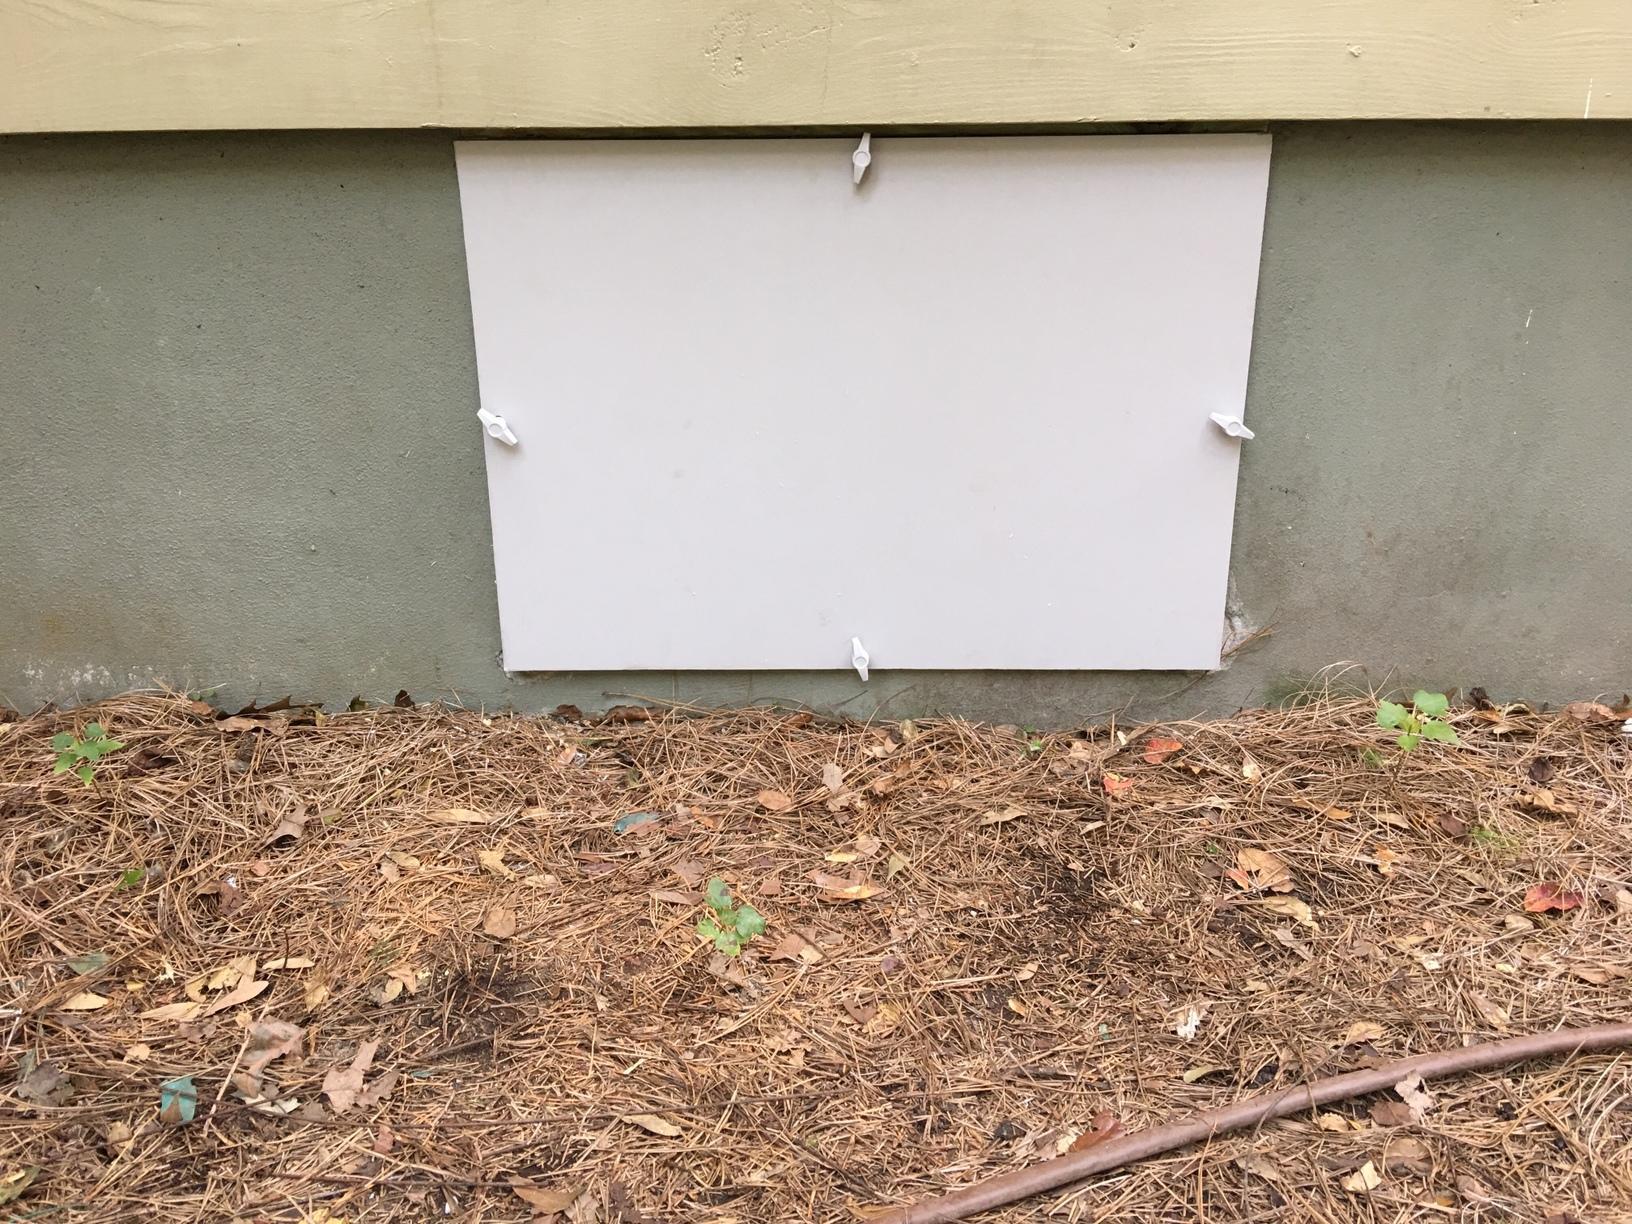 Sagging Floors & Sheet Rock Cracks Worries Homeowner in Mayesville, SC - After Photo